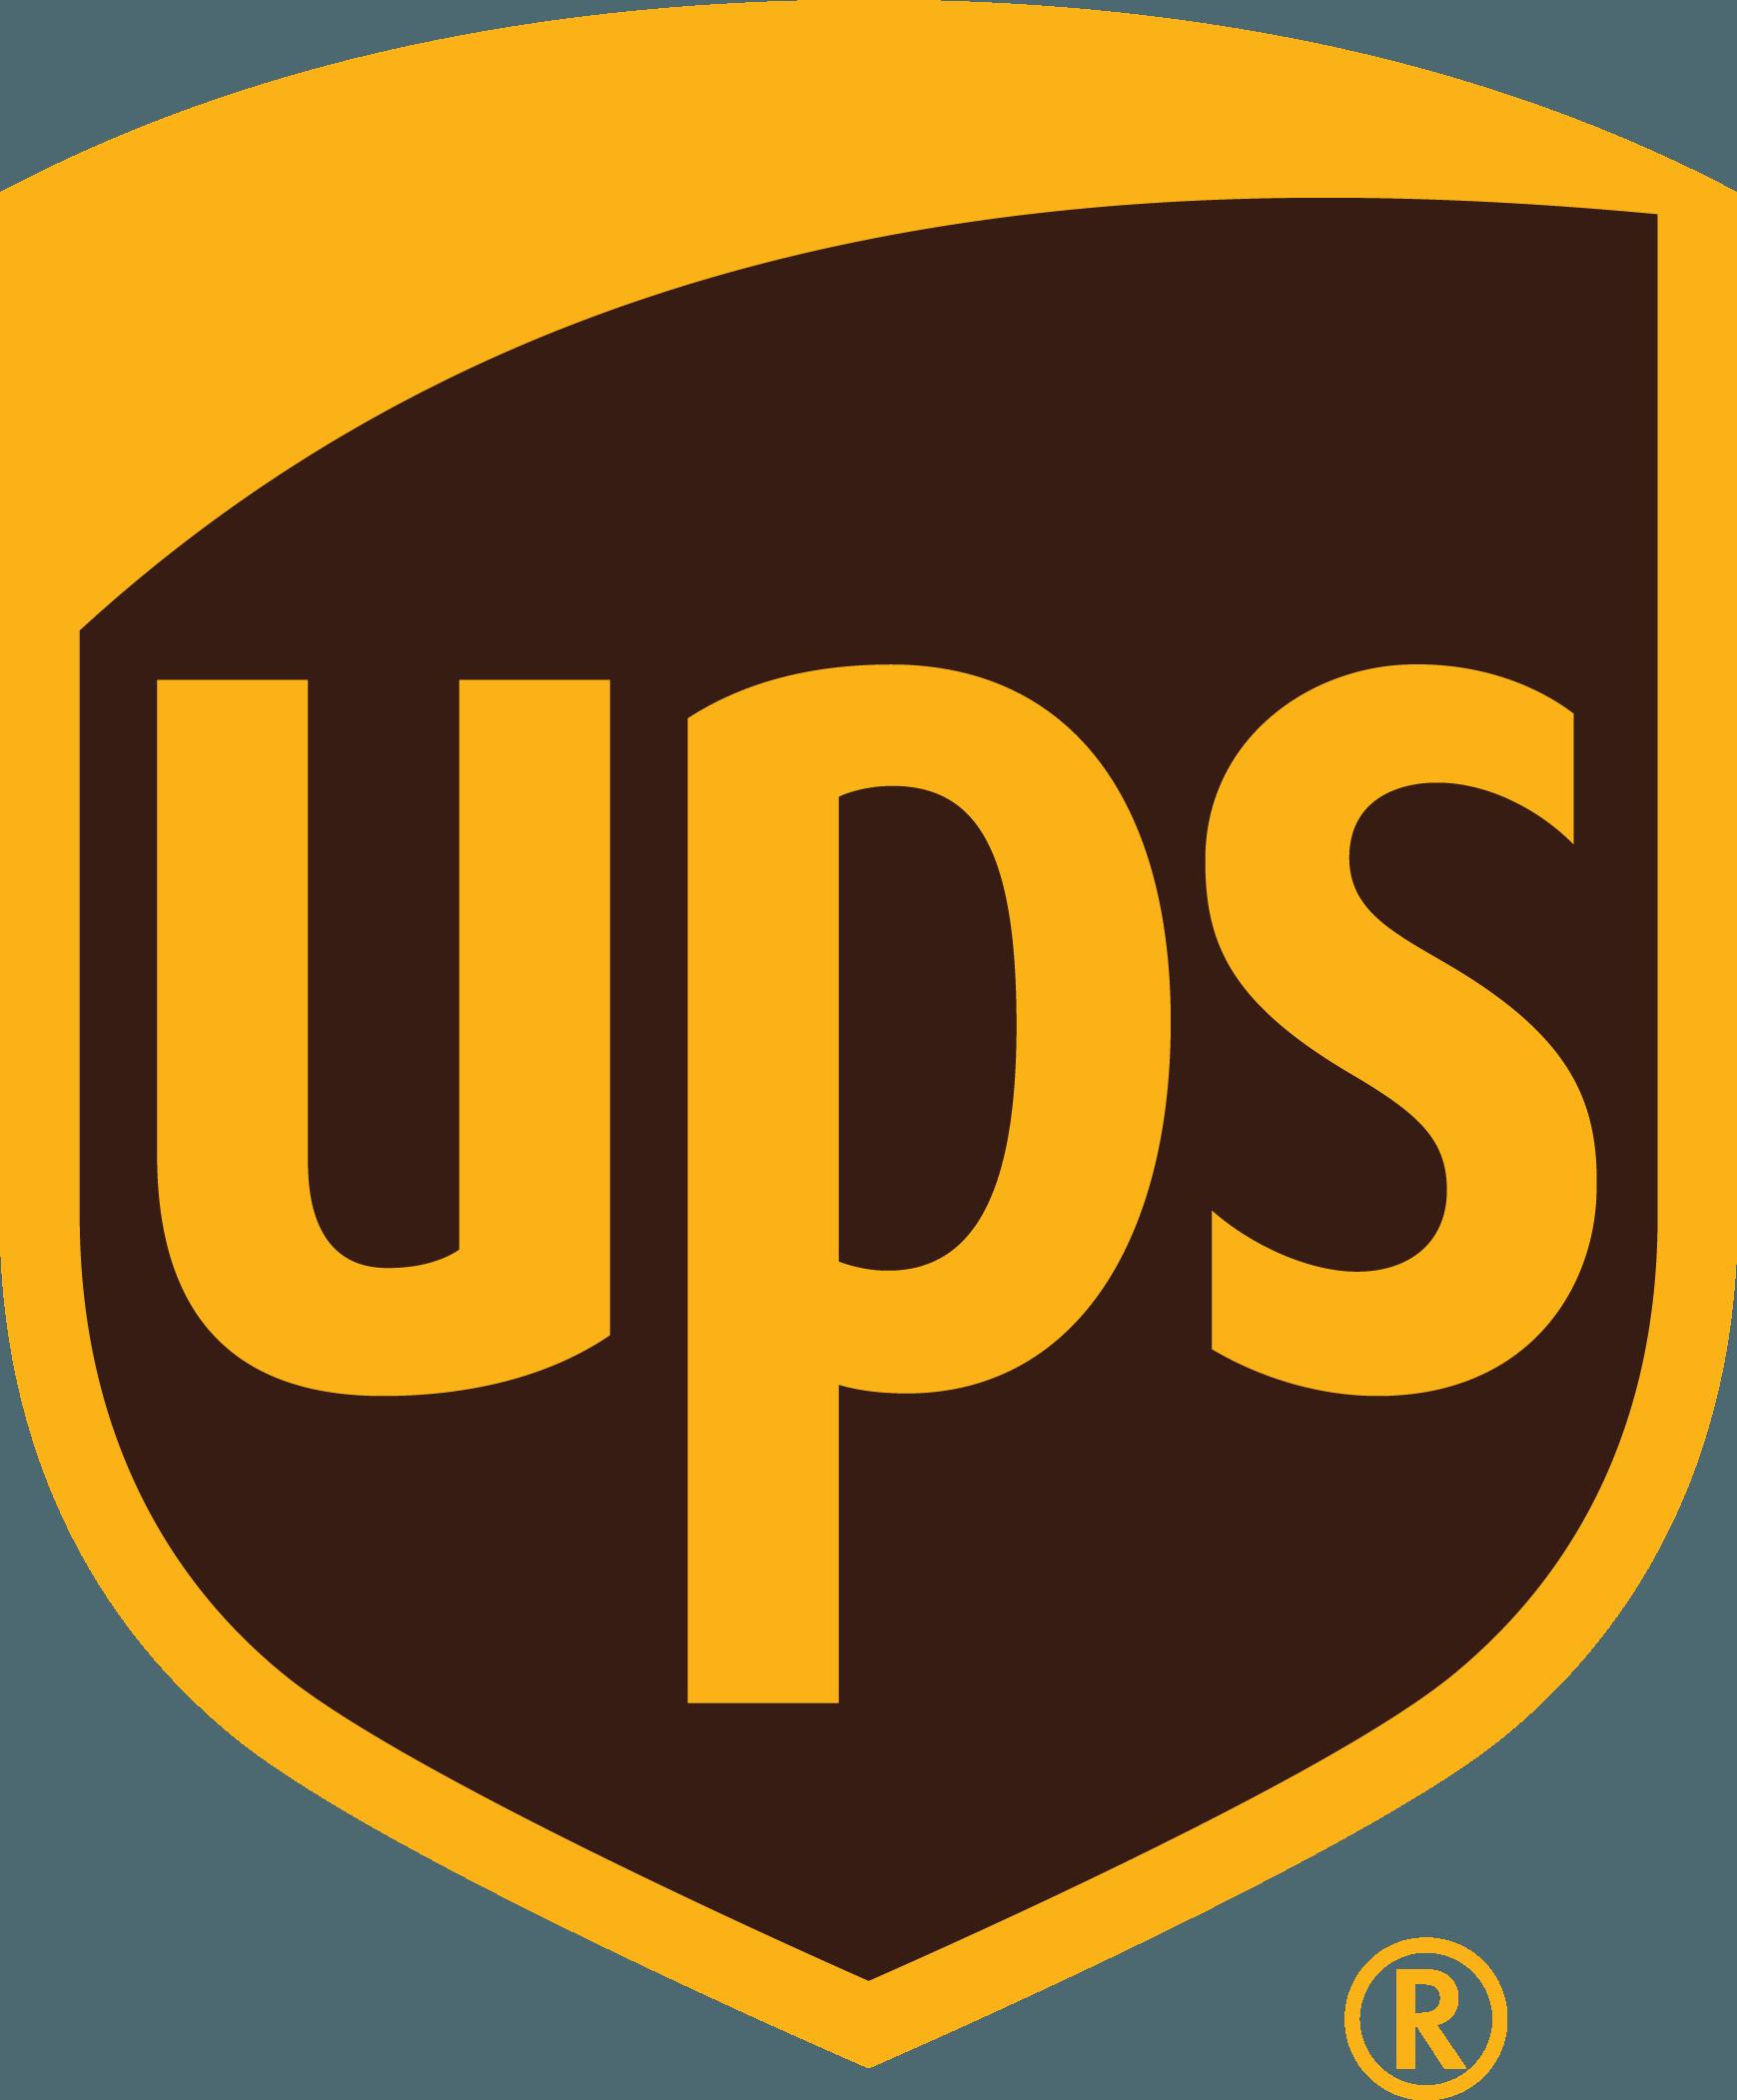 ups logo united parcel service vector eps free download logo rh freelogovectors net ups logo vector file usps vector logo